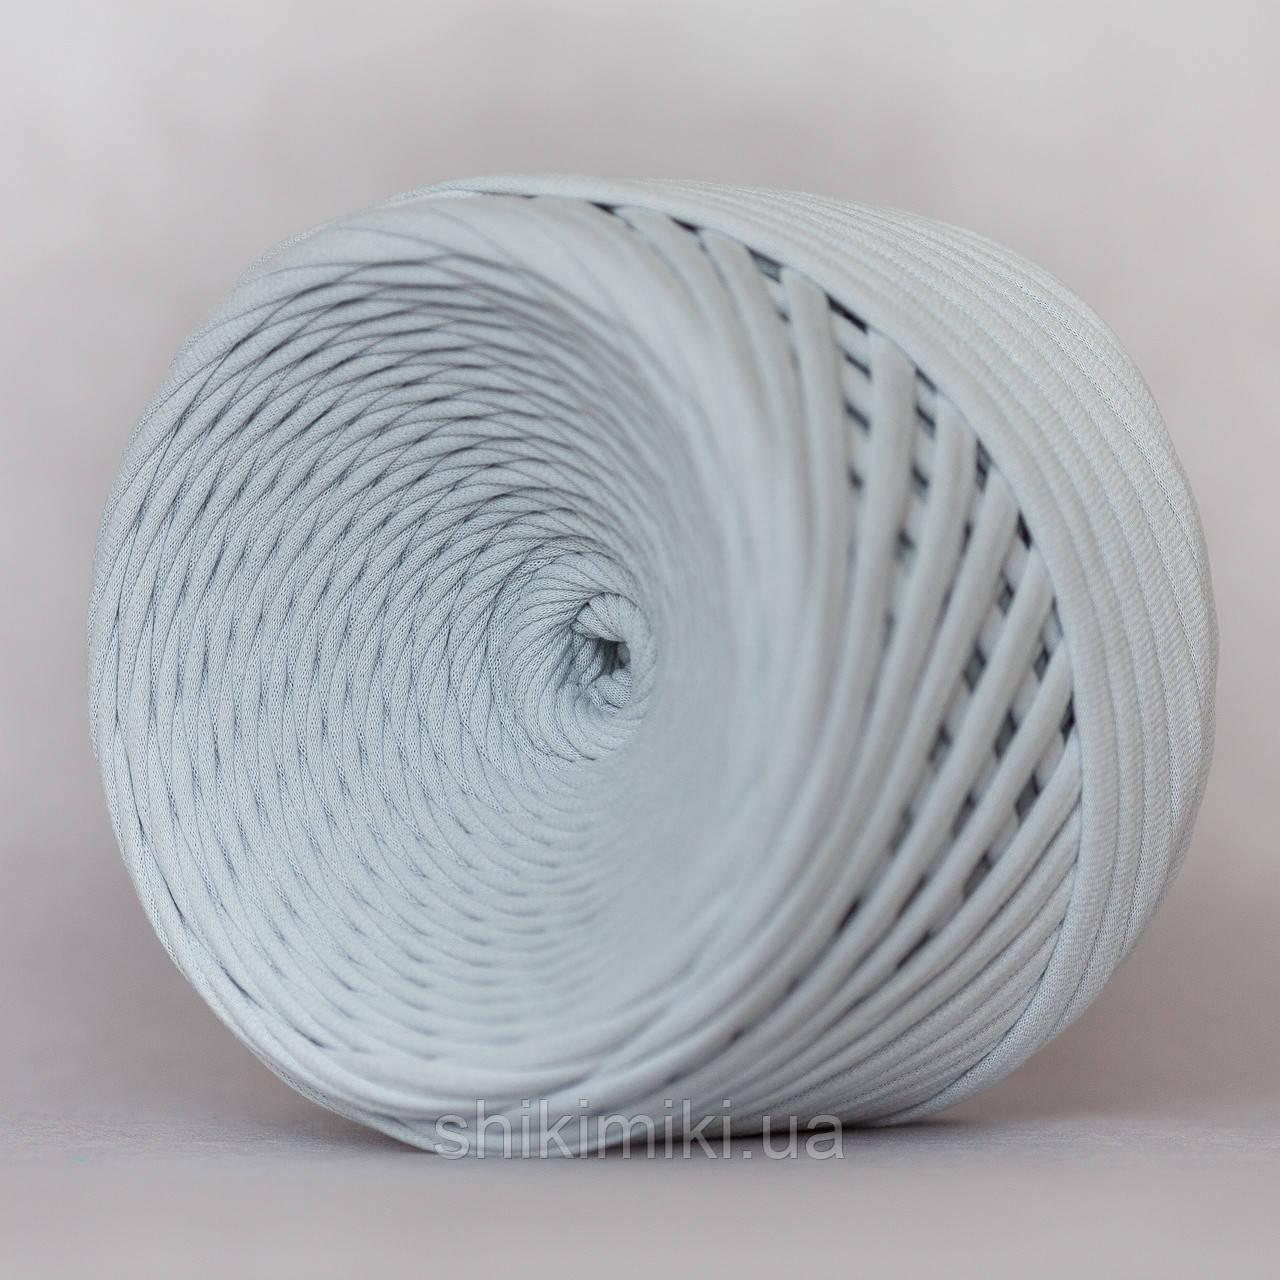 Трикотажная пряжа (5-7 мм), цвет Серебро